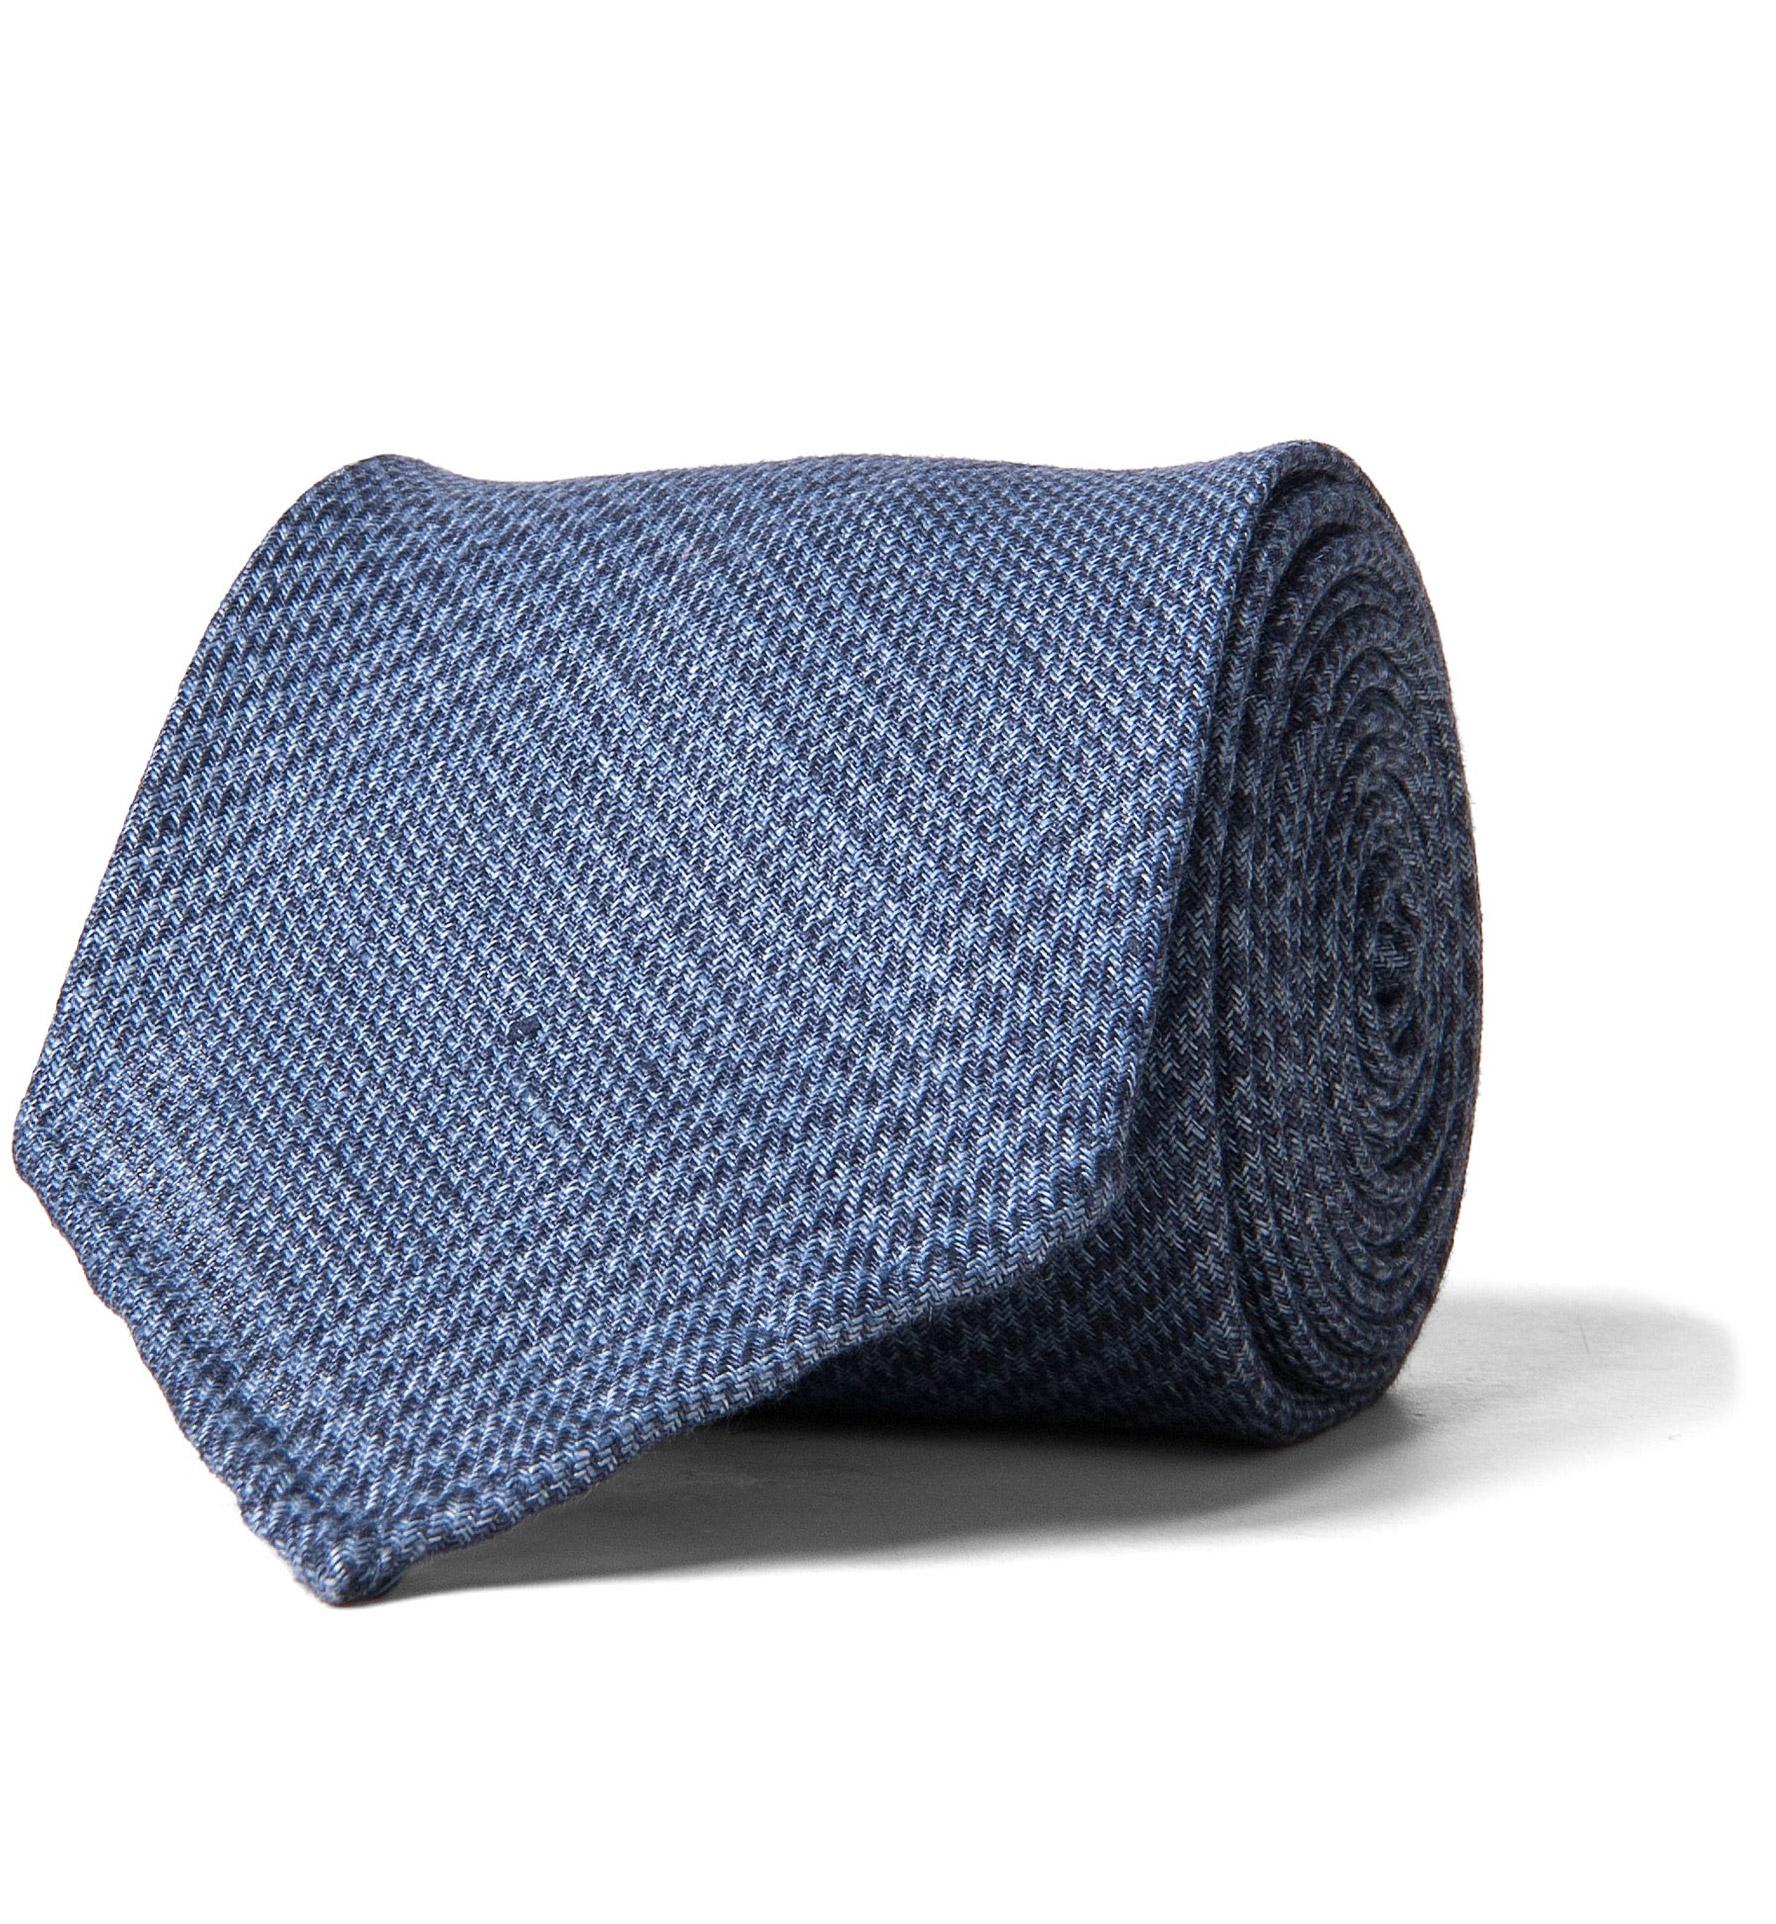 Zoom Image of Slate Blue Glen Plaid Linen Tie